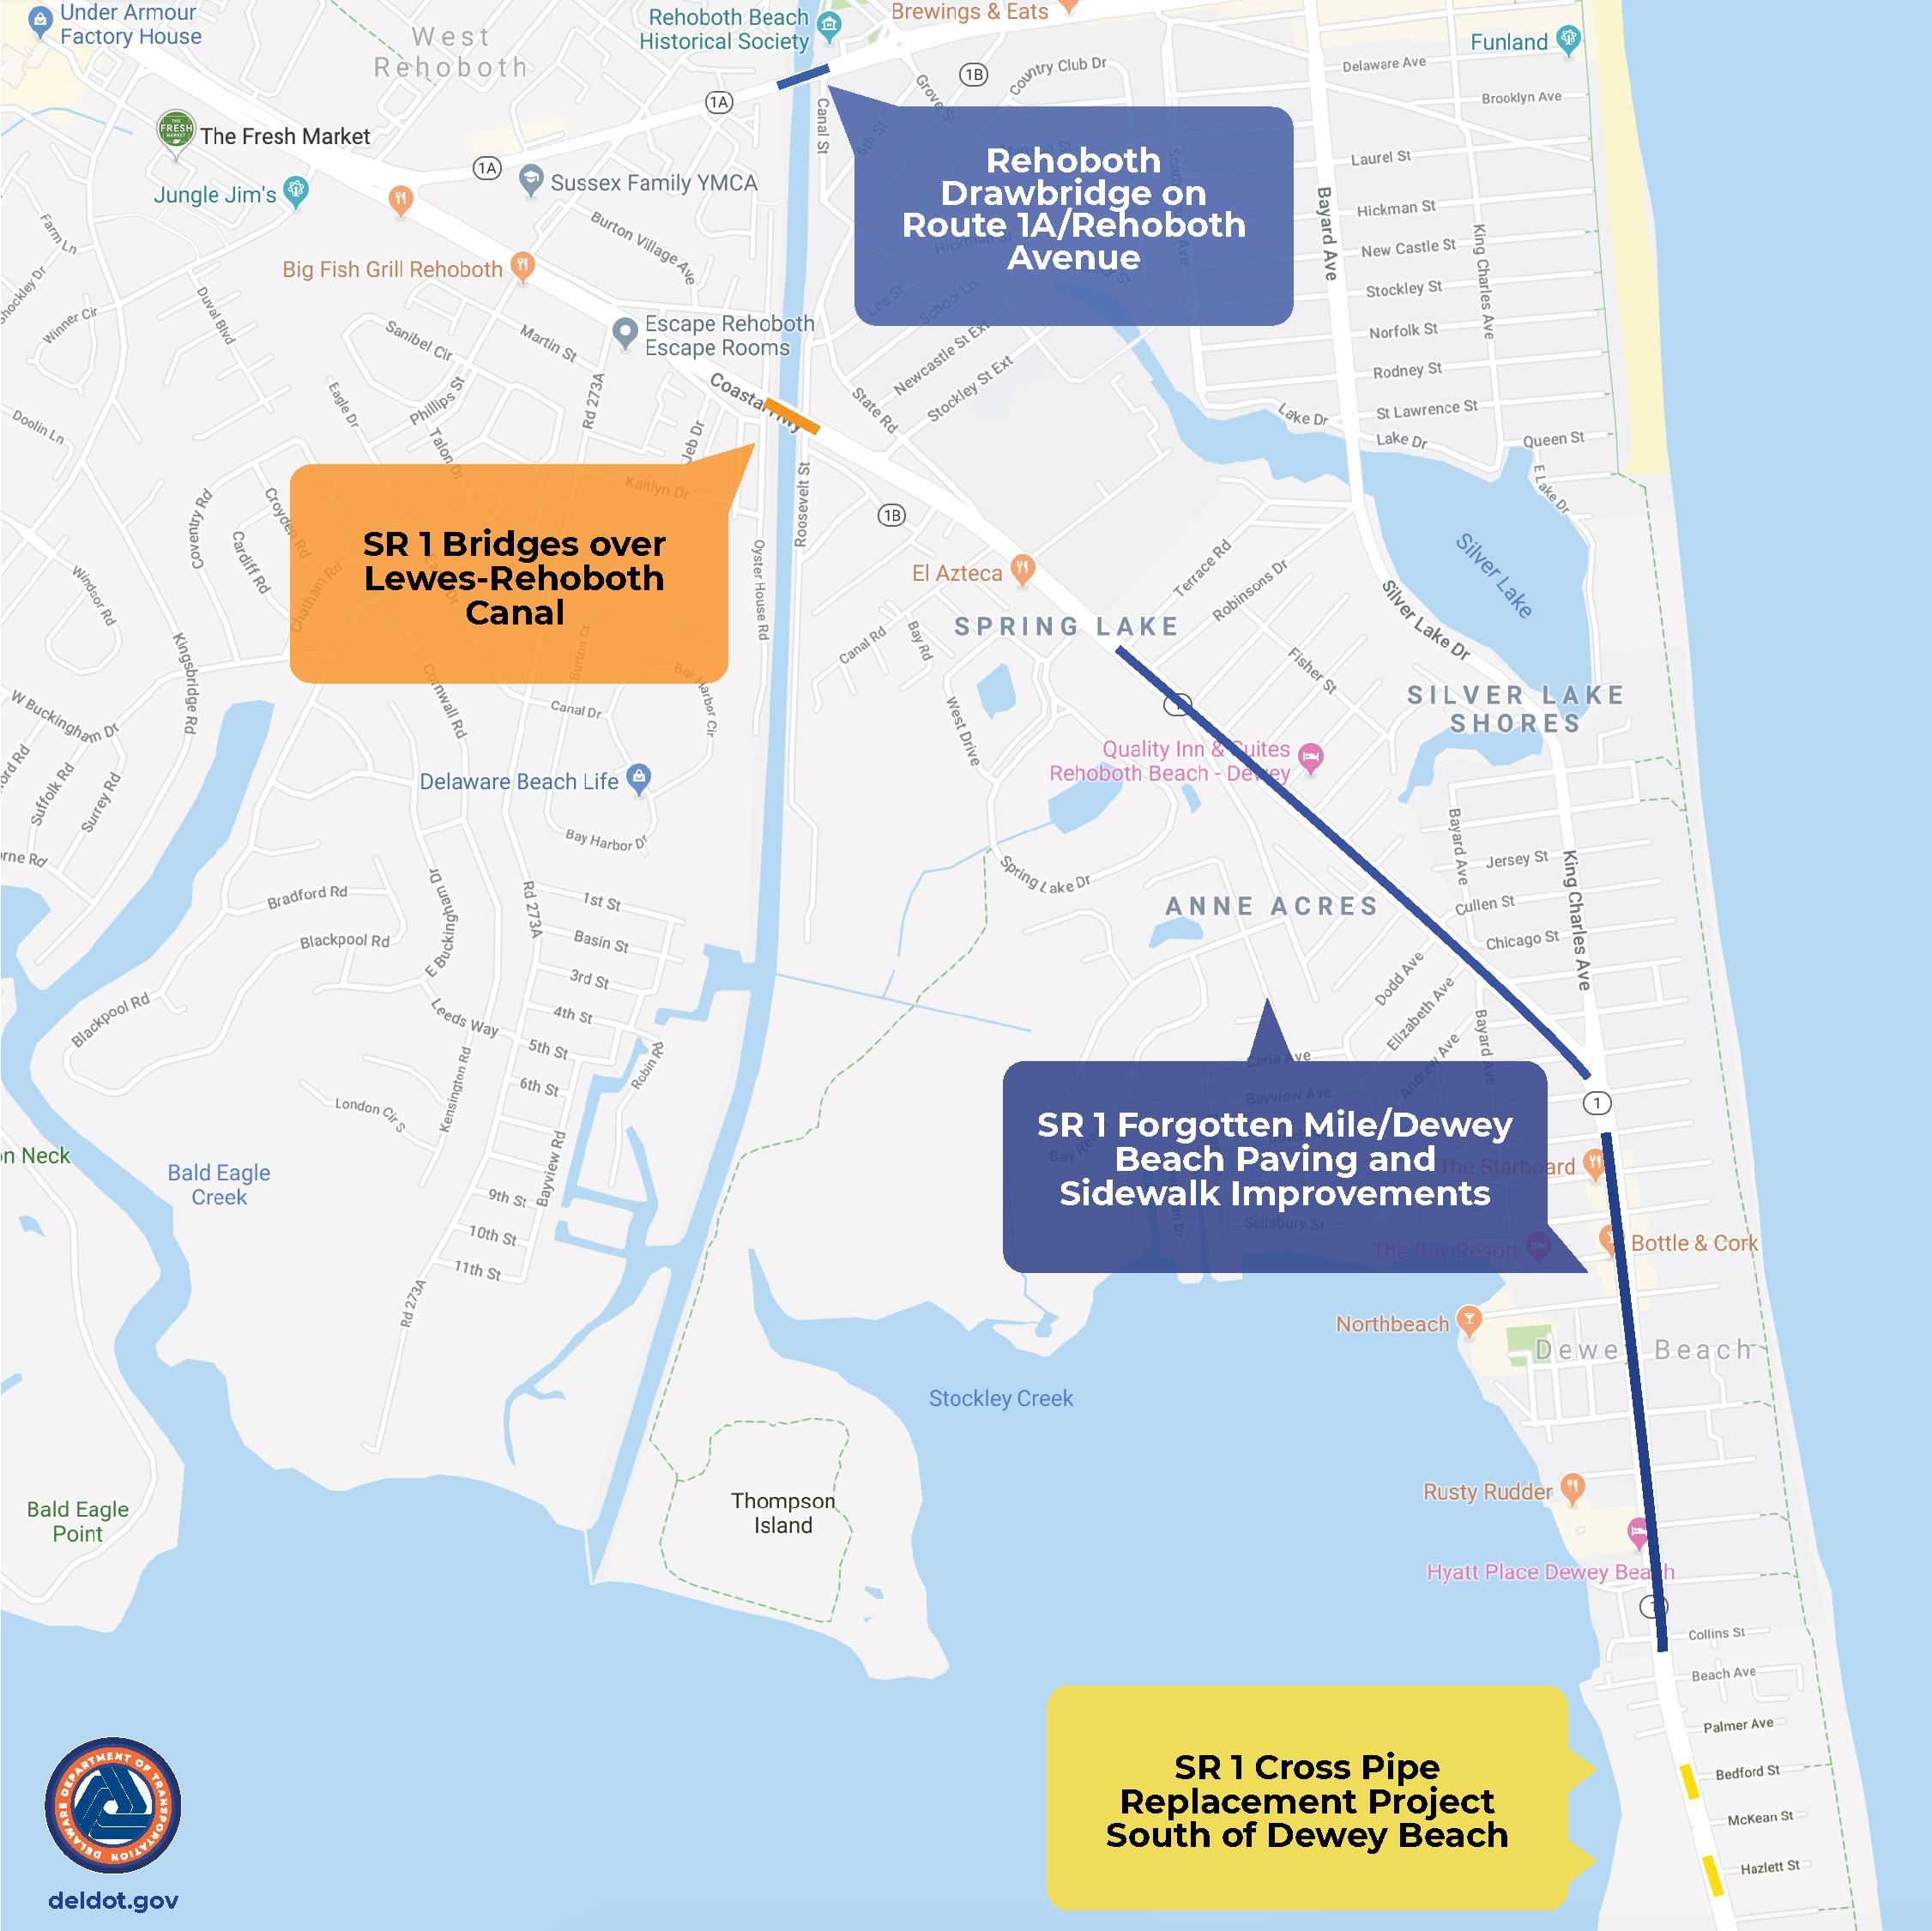 Offseason Projects for Rehoboth Beach & Dewey Beach Corridor